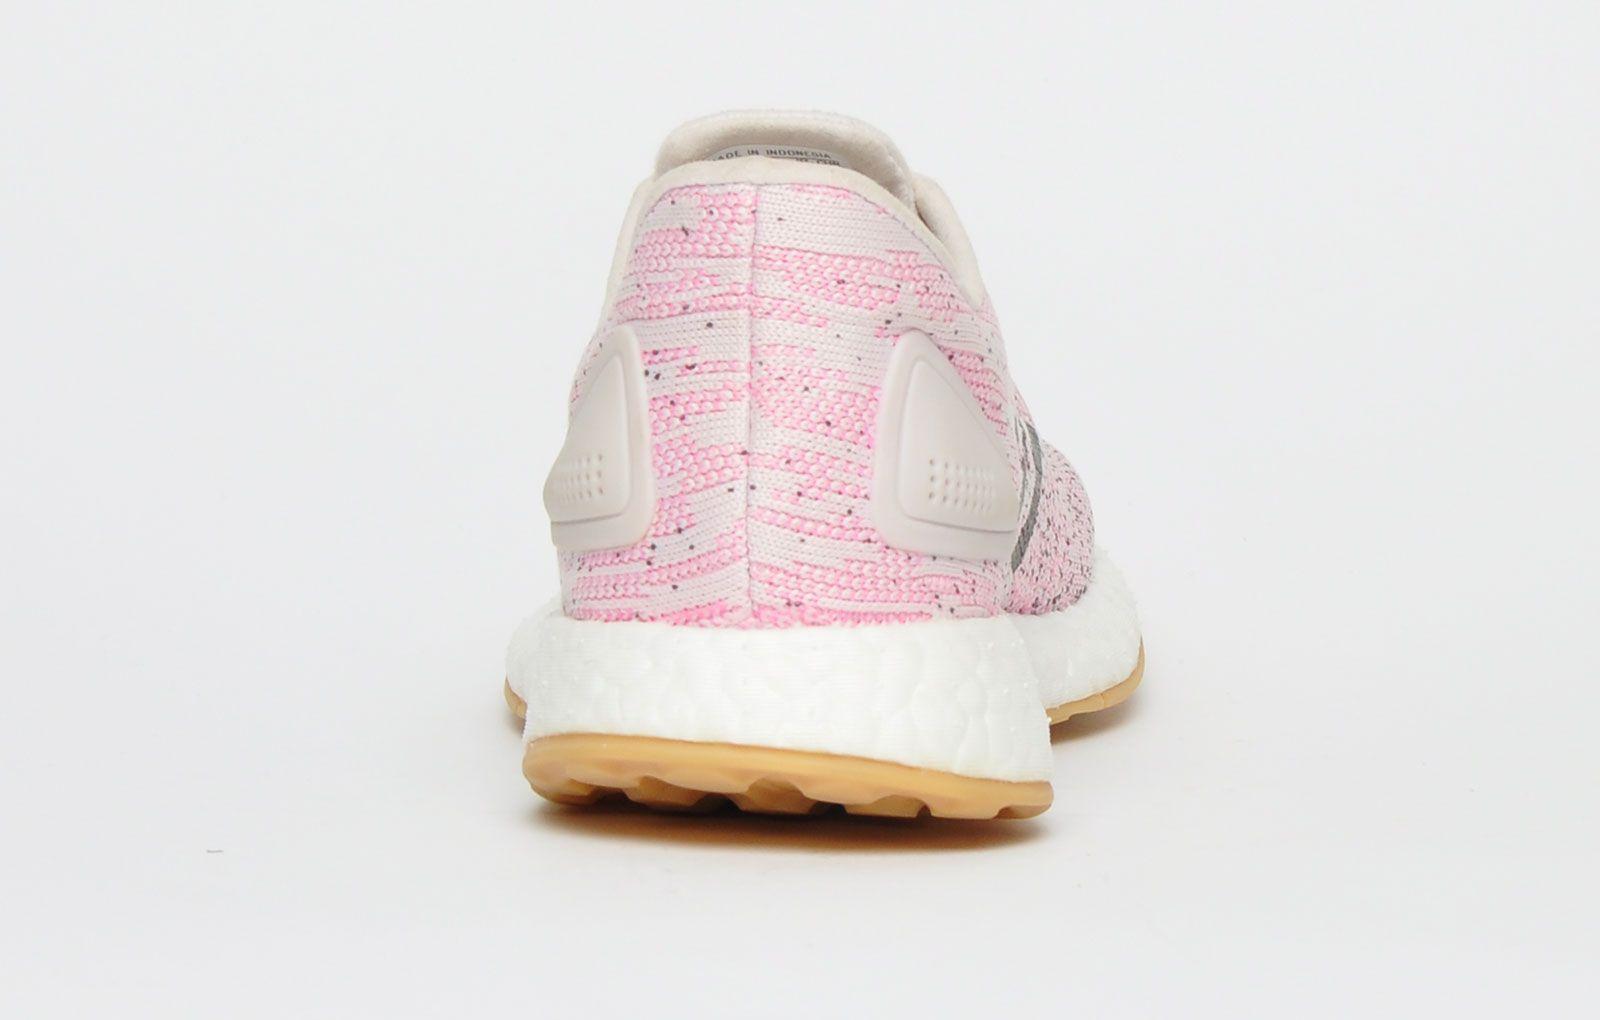 Adidas Pureboost DPR Womens